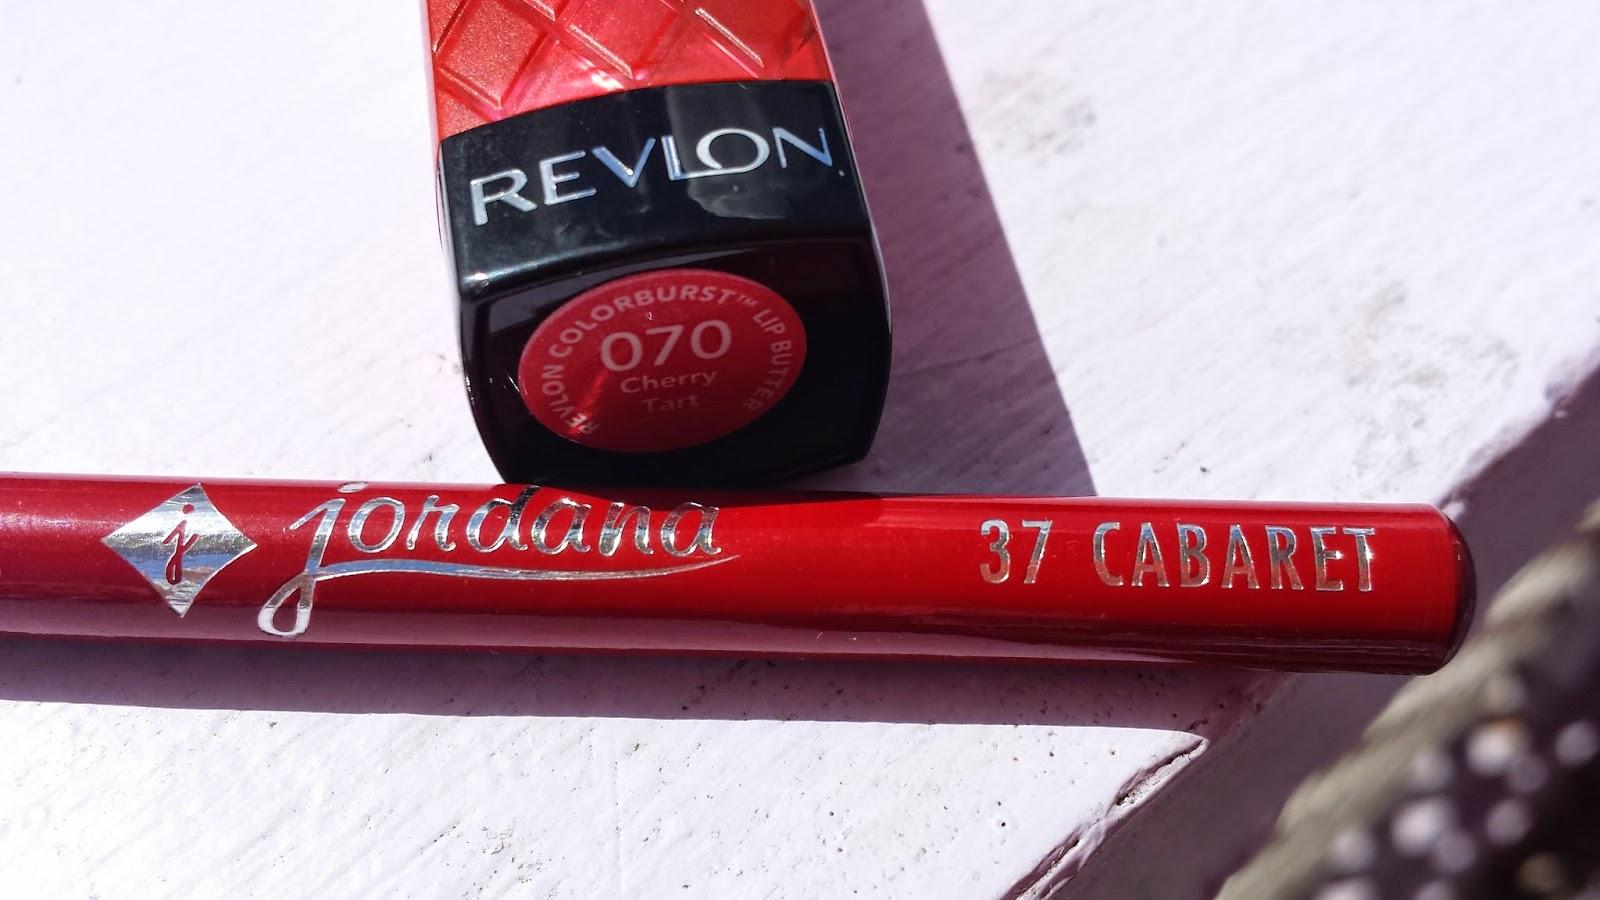 Revlon Lip Butter 'Cherry Tart' and Jordana Lipliner 'Cabaret'- www.modenmakeup.com